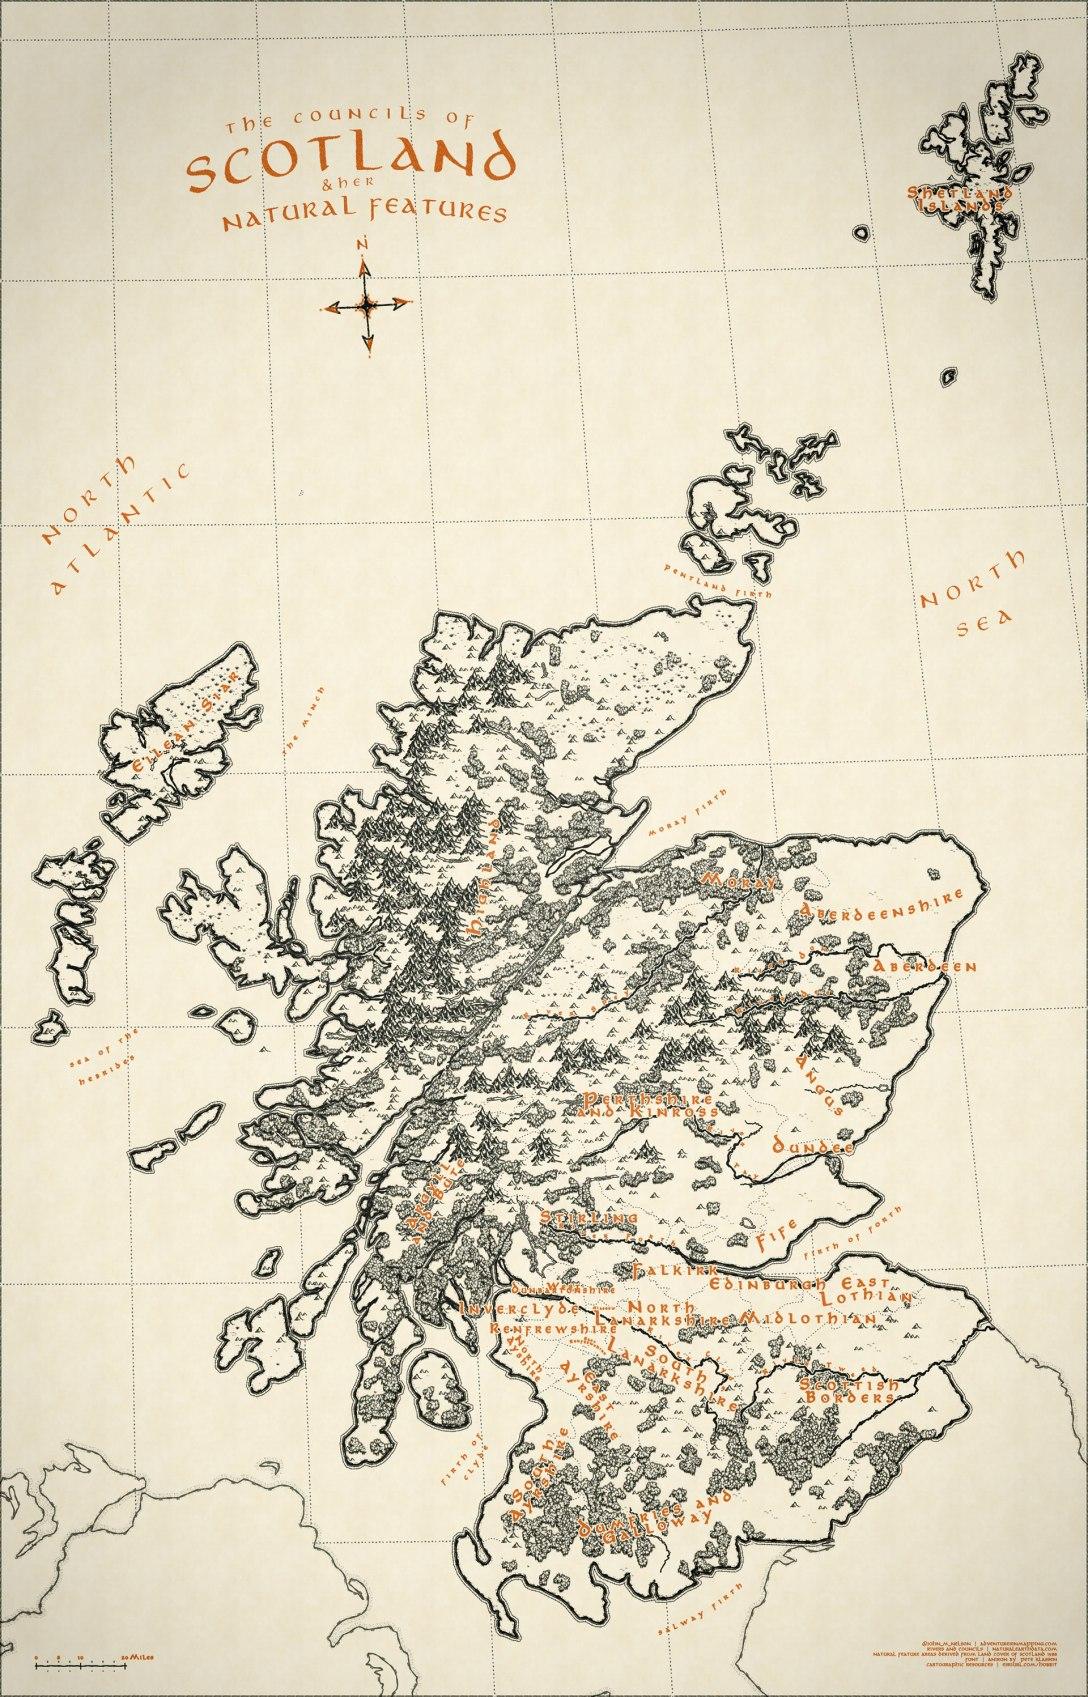 LOTR_Scotland_print2